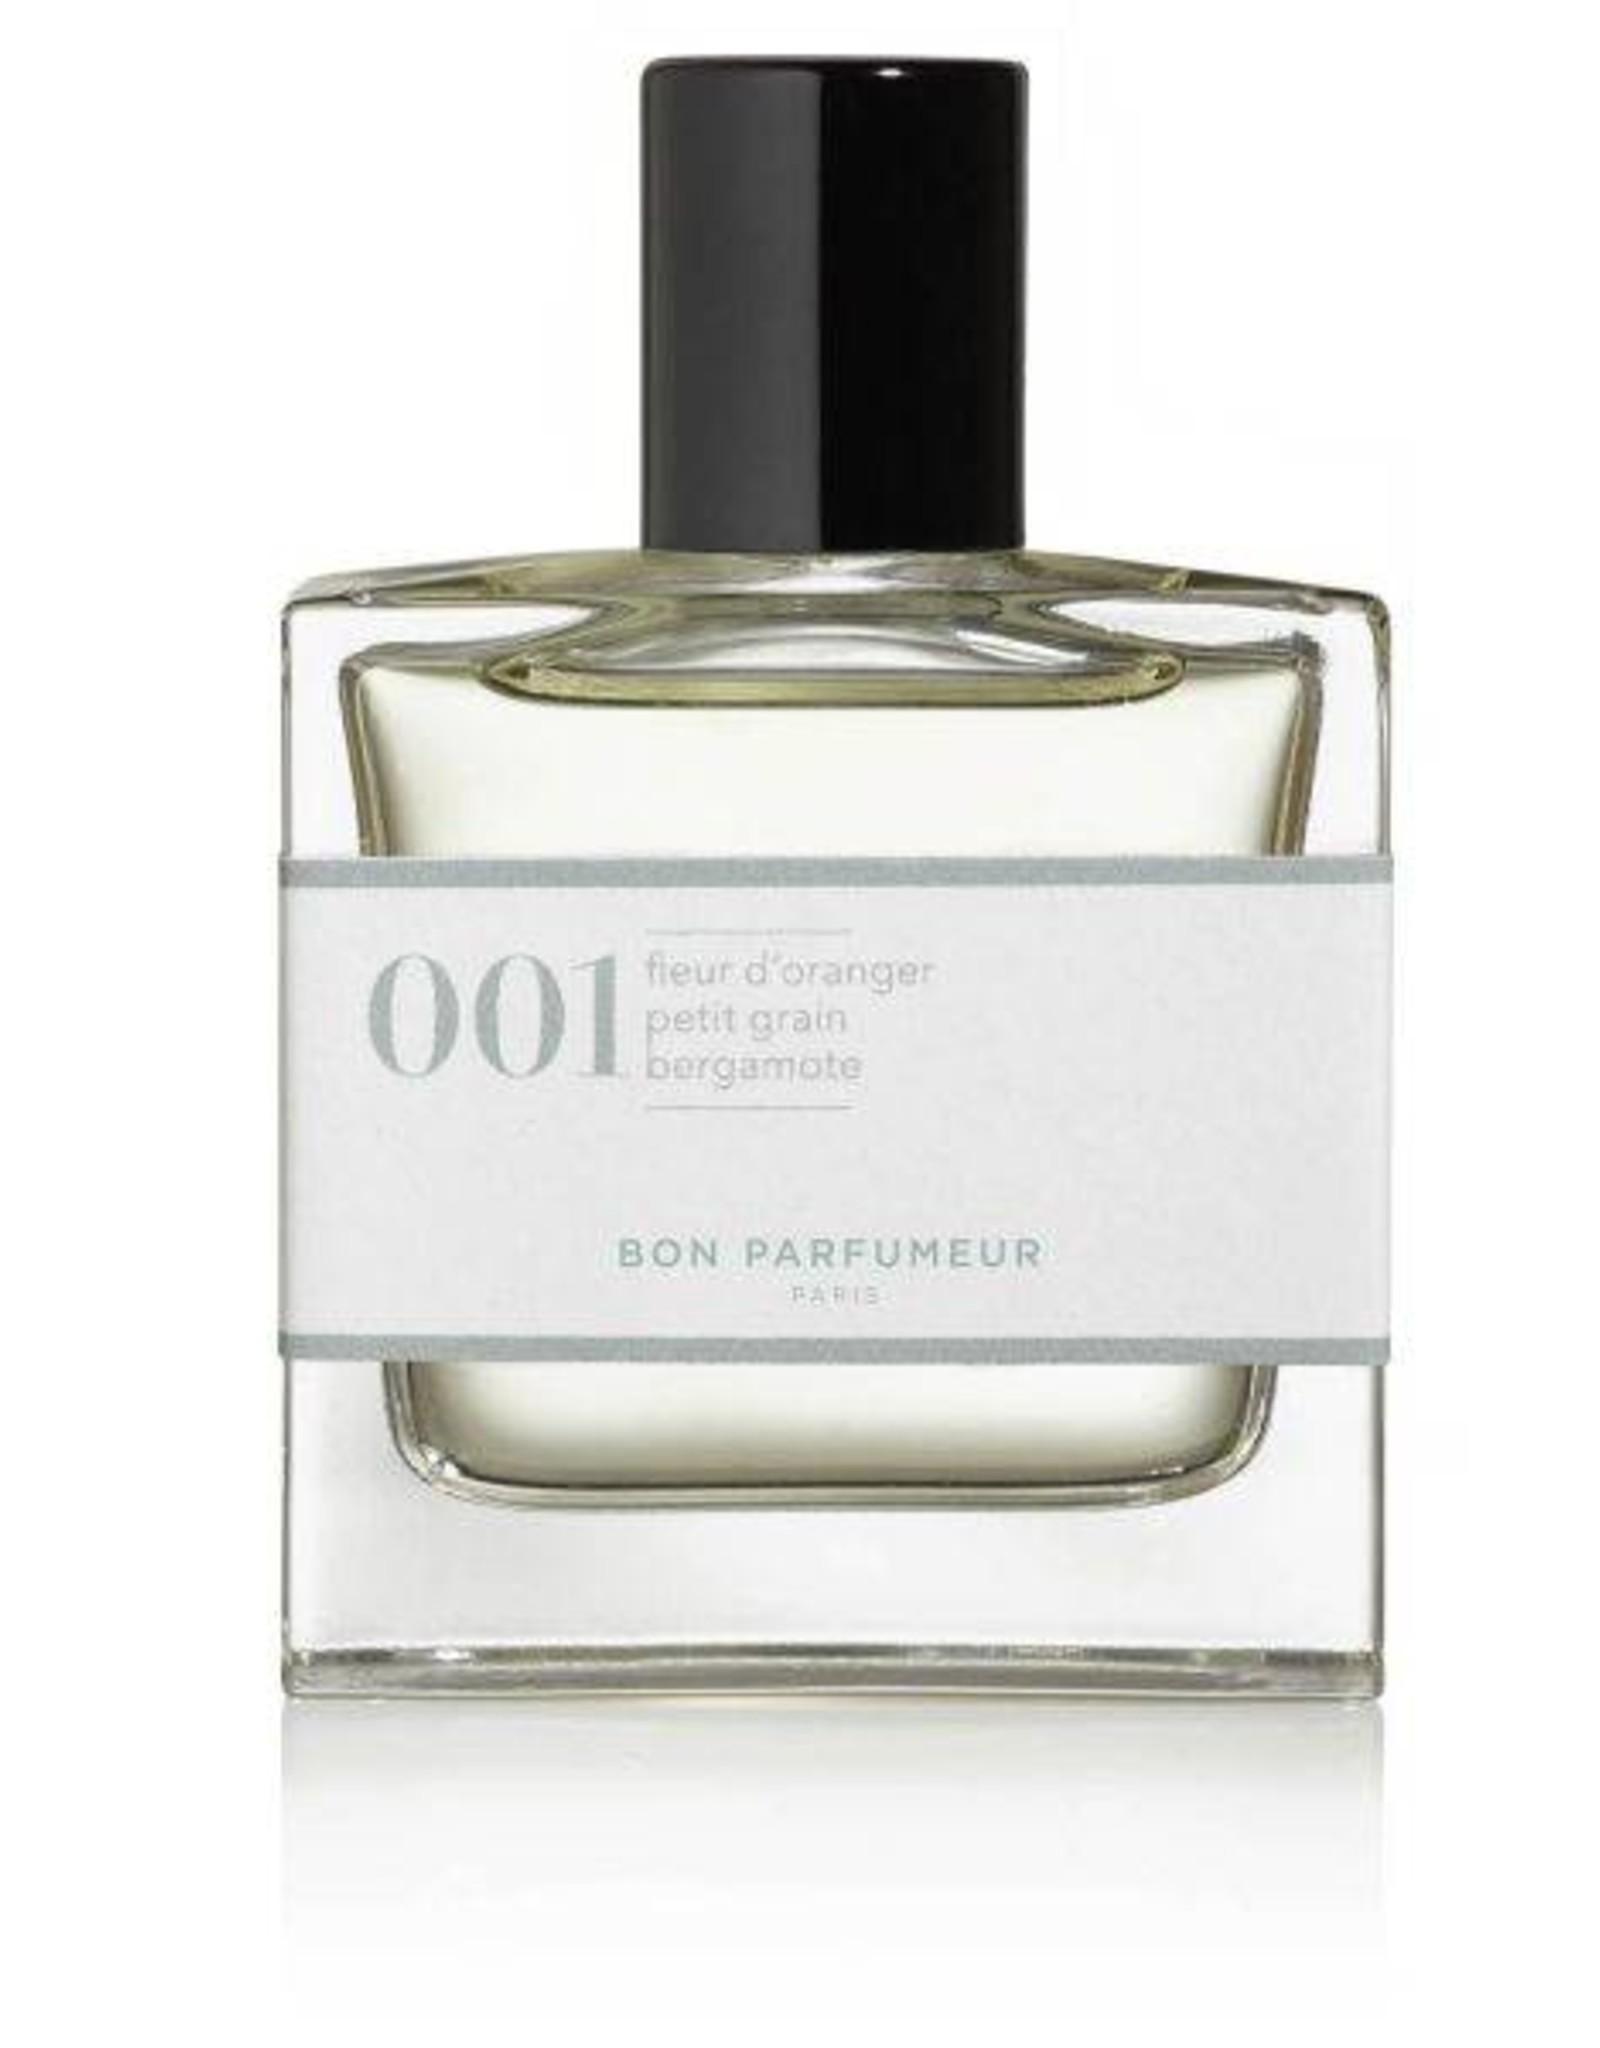 Bon Parfumeur Bon Parfumeur 001 orange blossom, petitgrain, bergamot